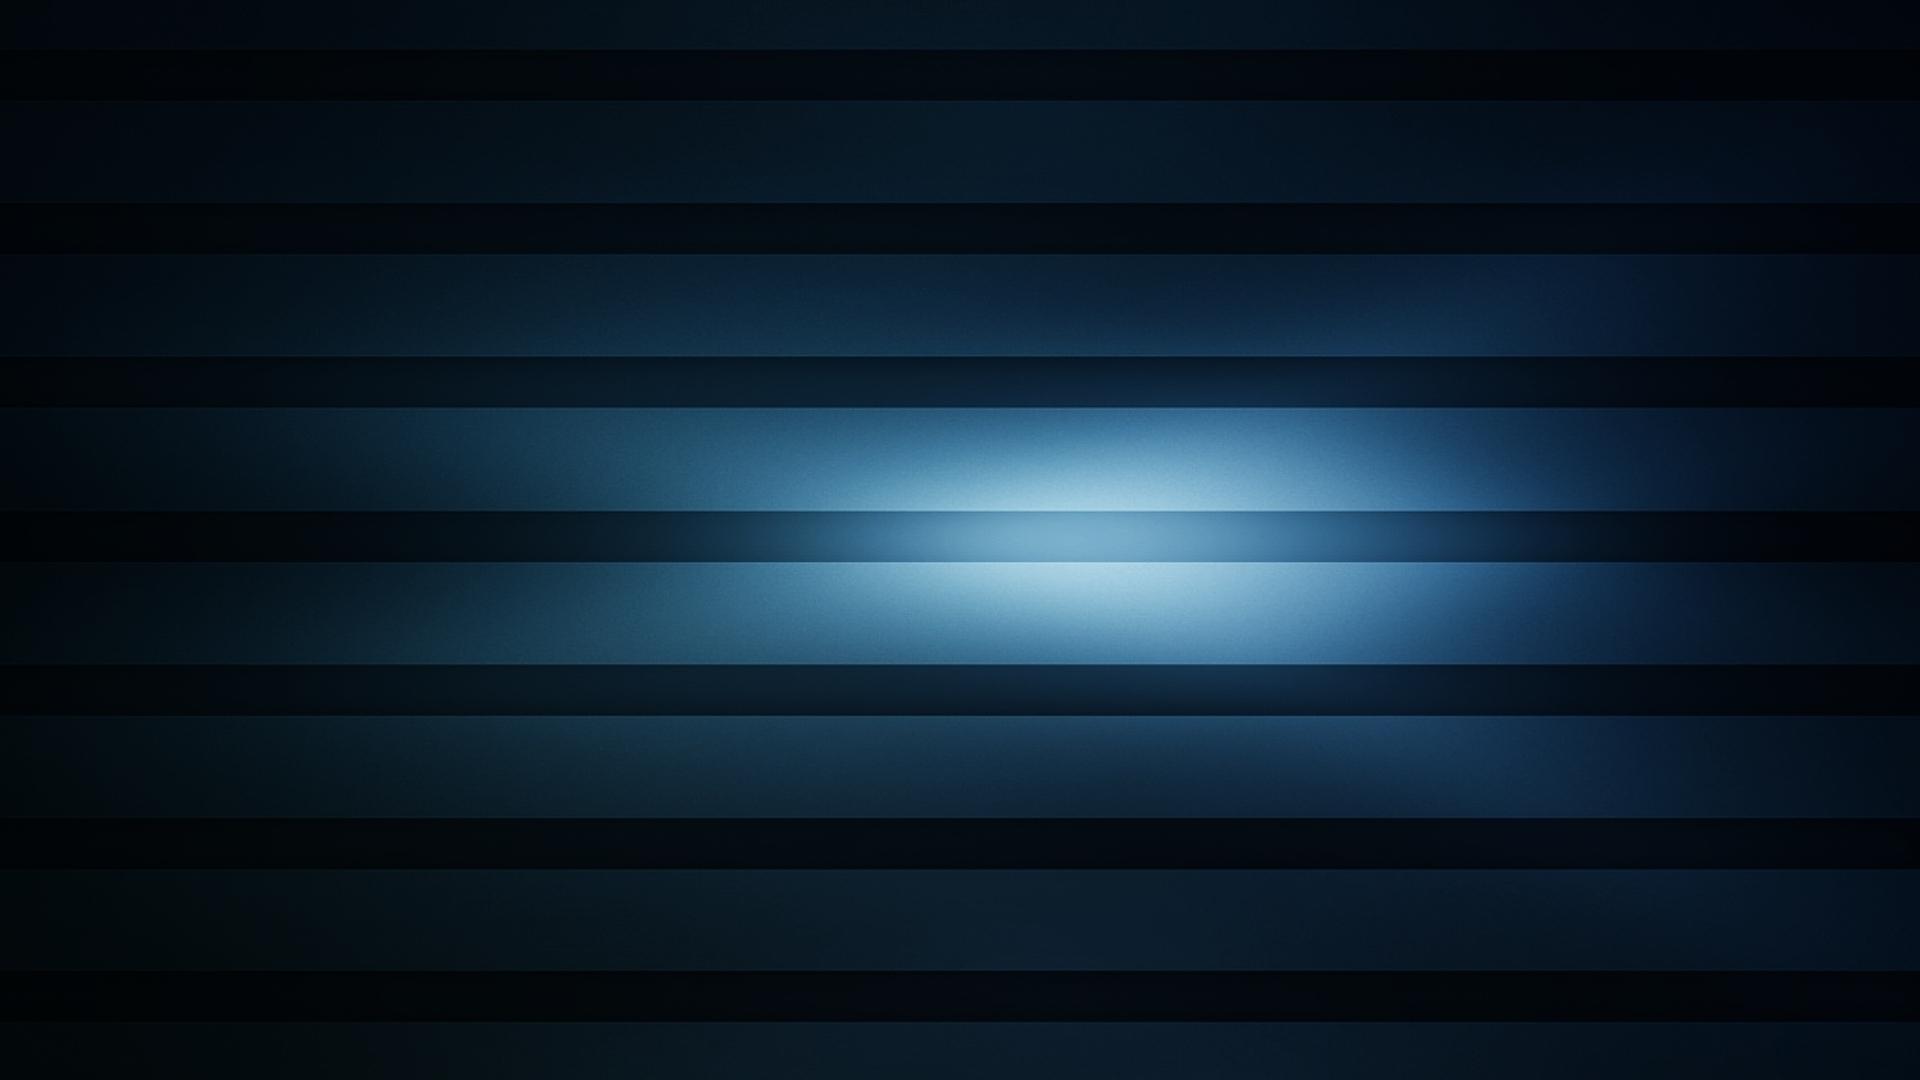 Download Wallpaper 1920x1080 stripes background blue horizontal 1920x1080